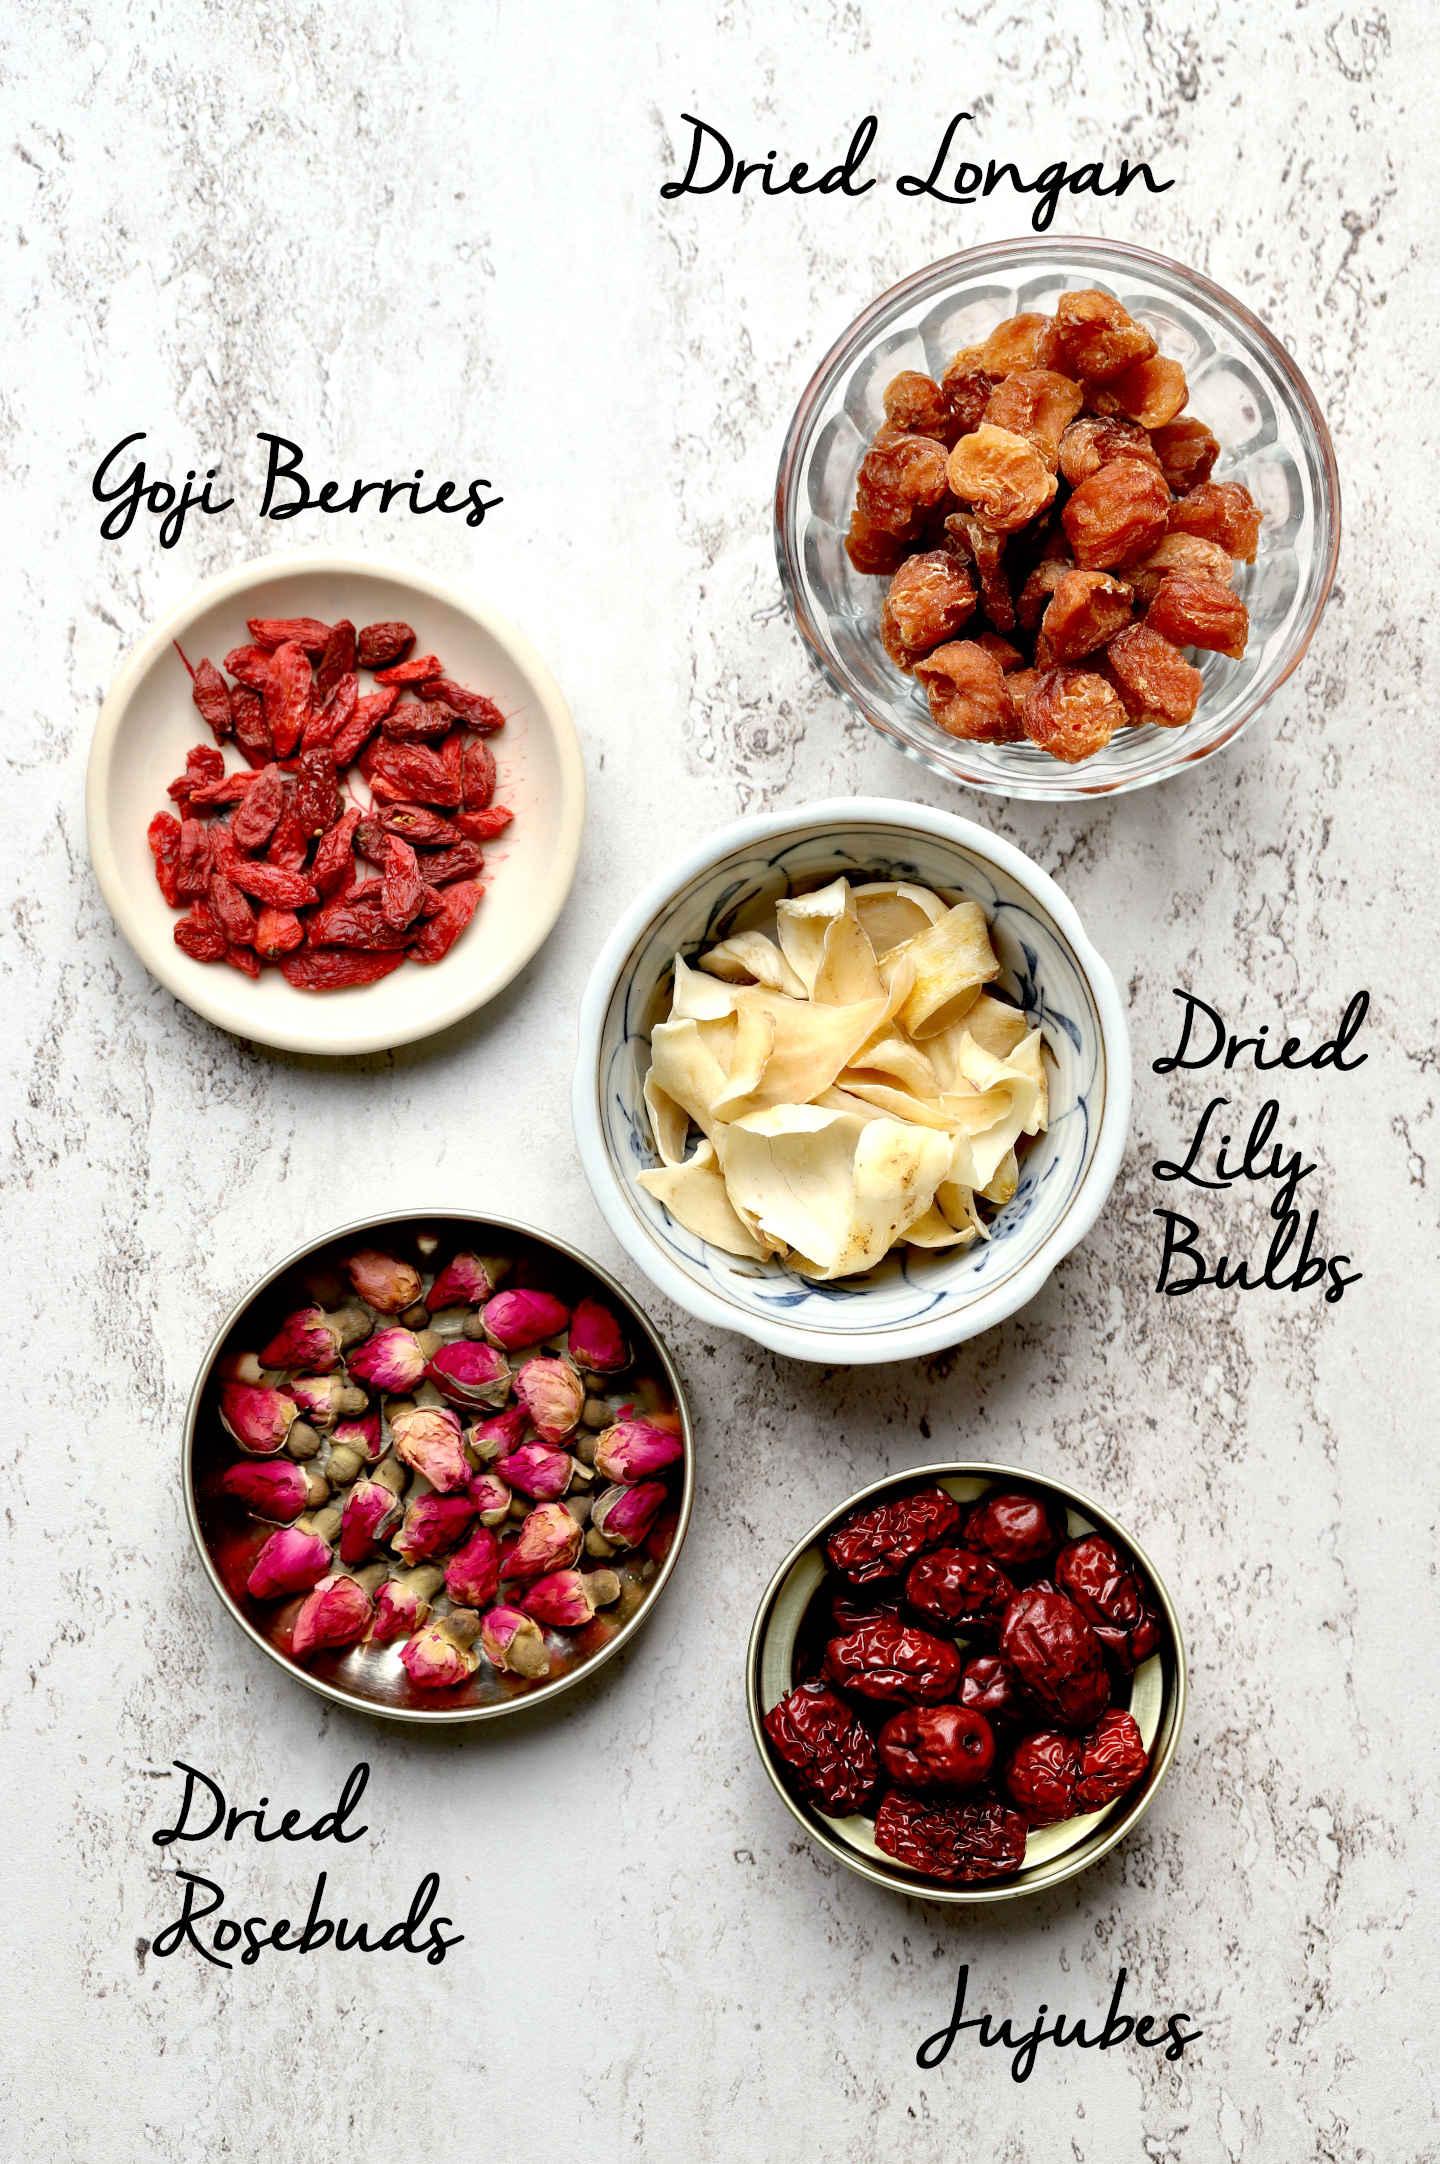 5 ingredients in this remedy: dried longan, goji berries, dried lily bulbs, dried rosebuds, jujubes